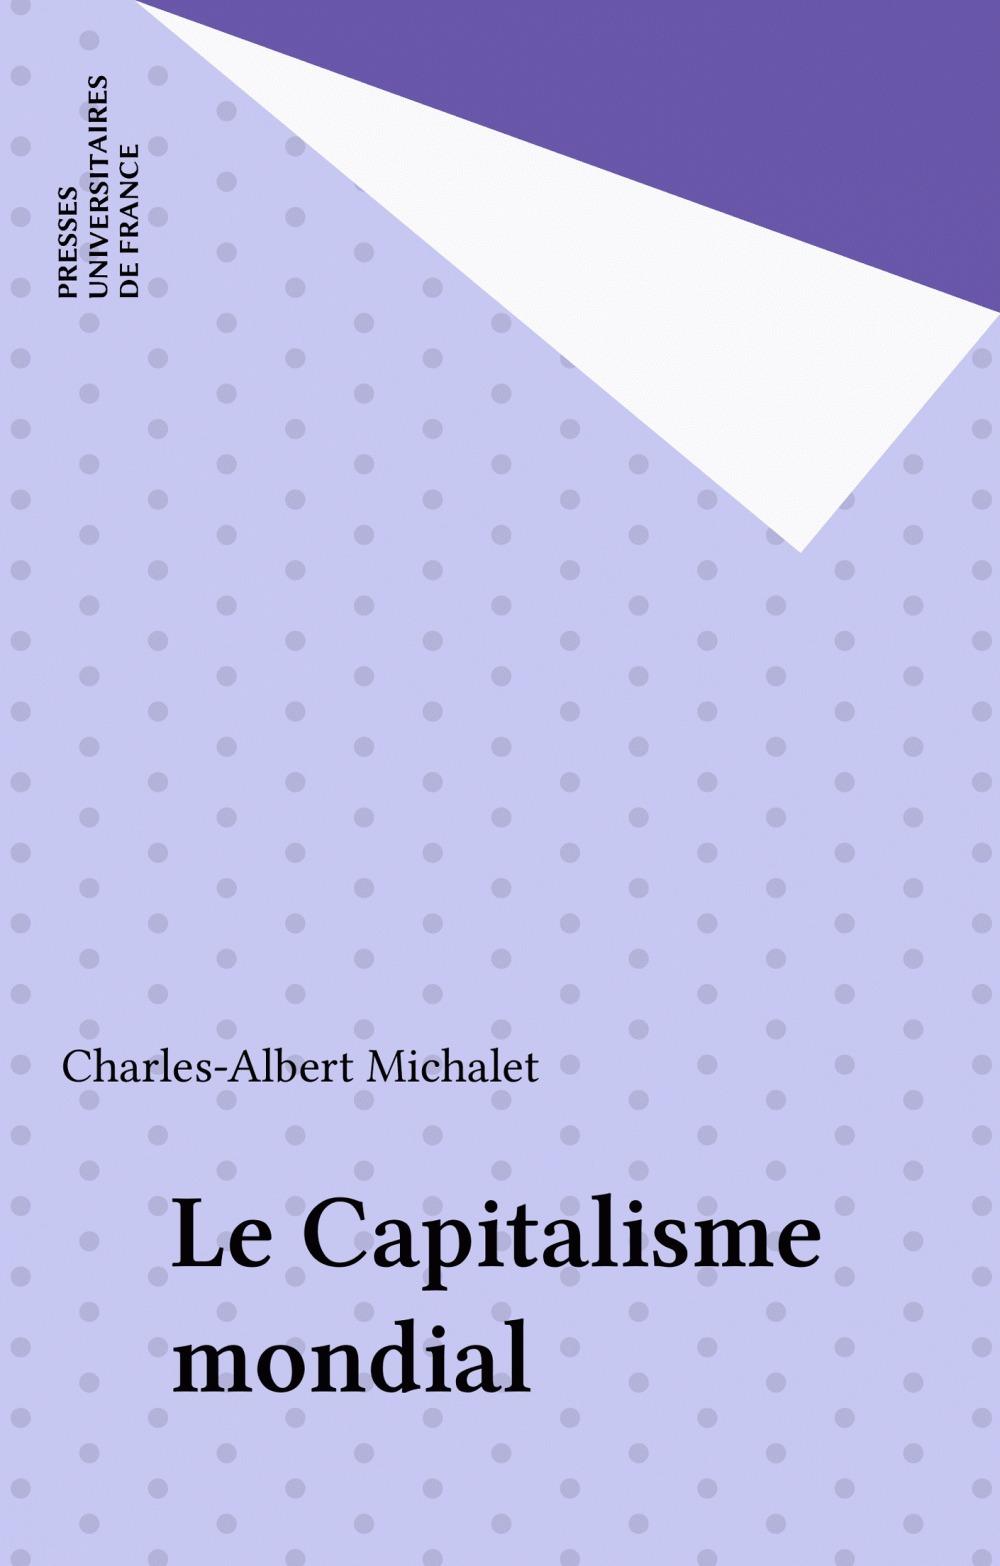 Le capitalisme mondial